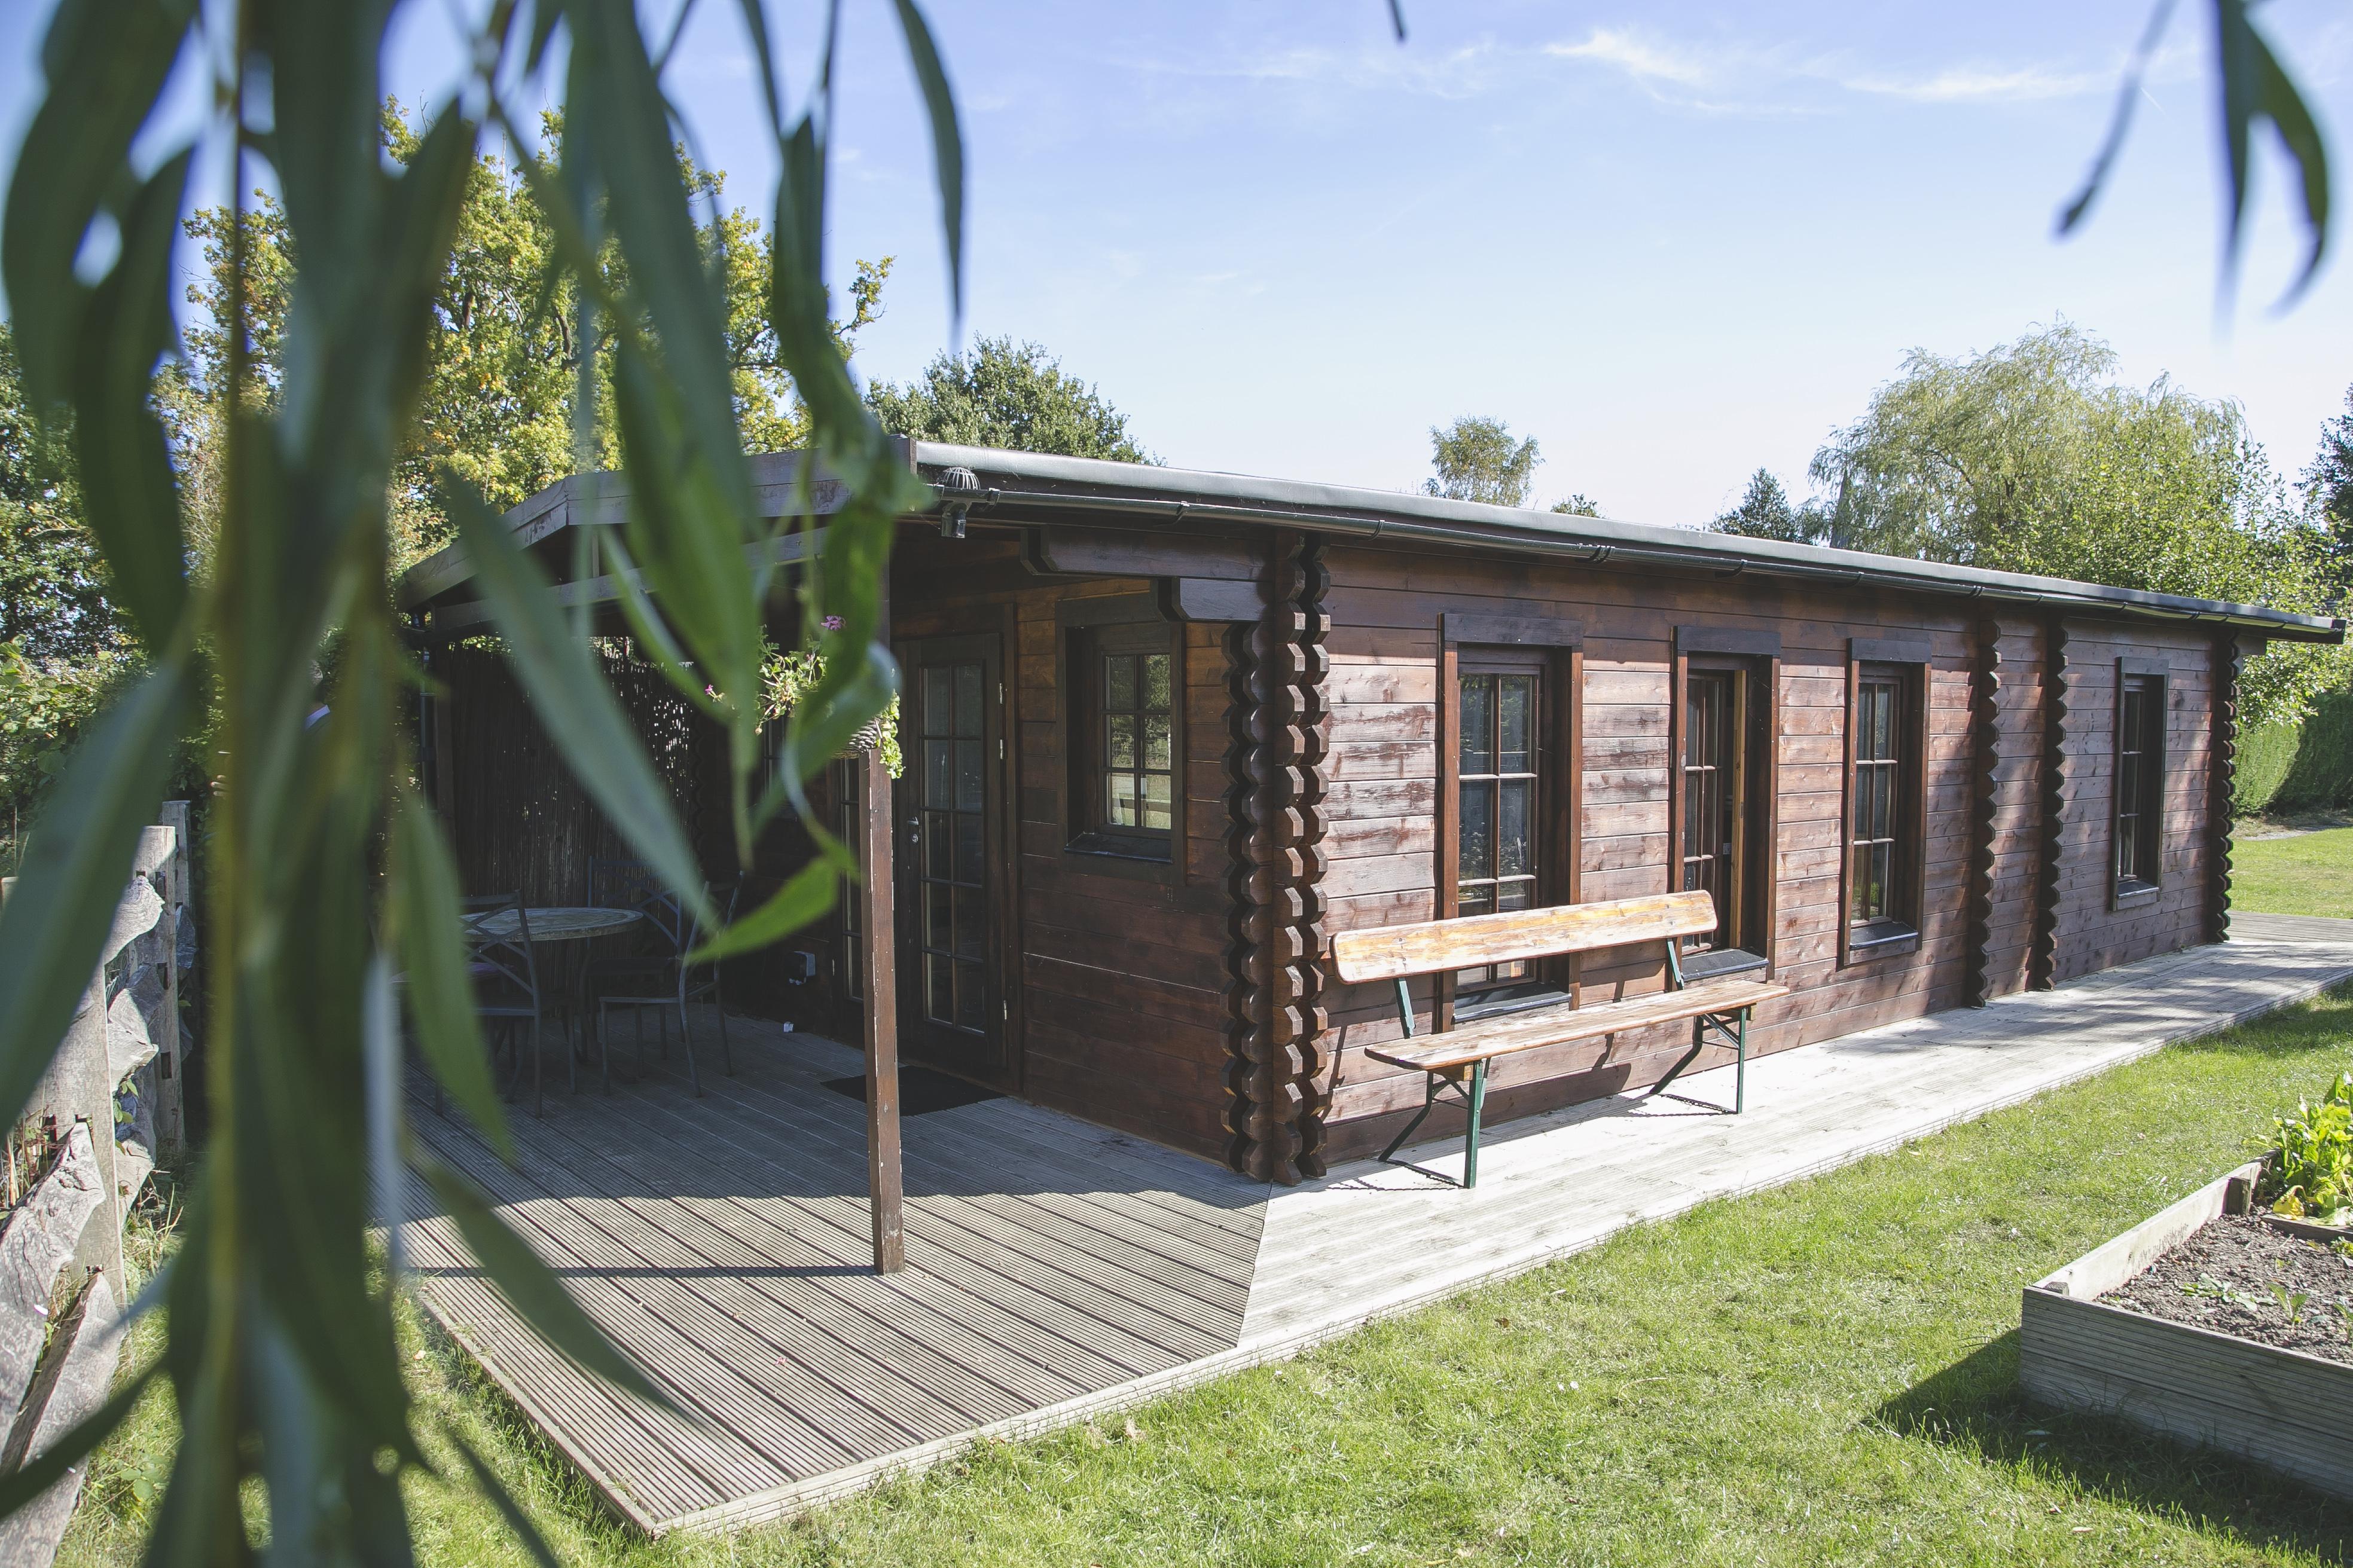 The Cabin - Kent (UK)